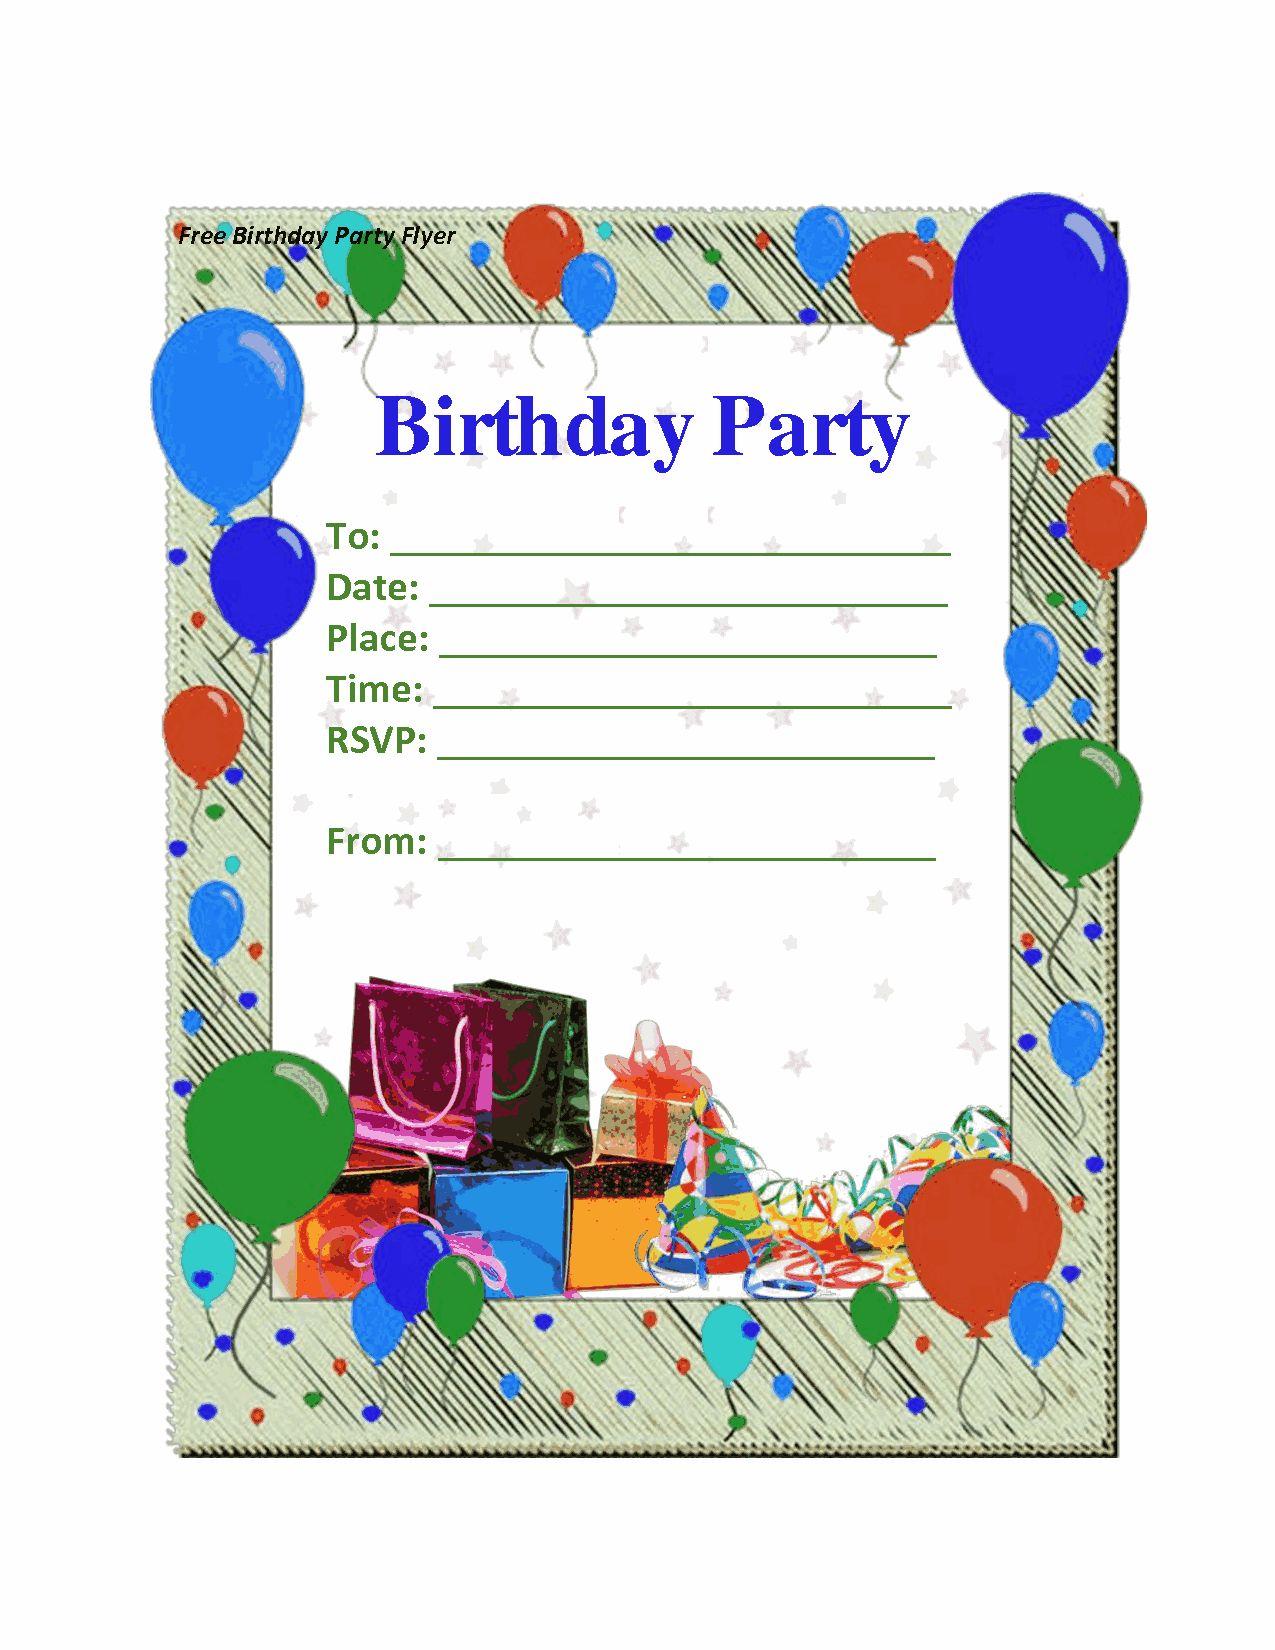 how to create birthday party invitation template check more at httpwww - Create Birthday Party Invitations